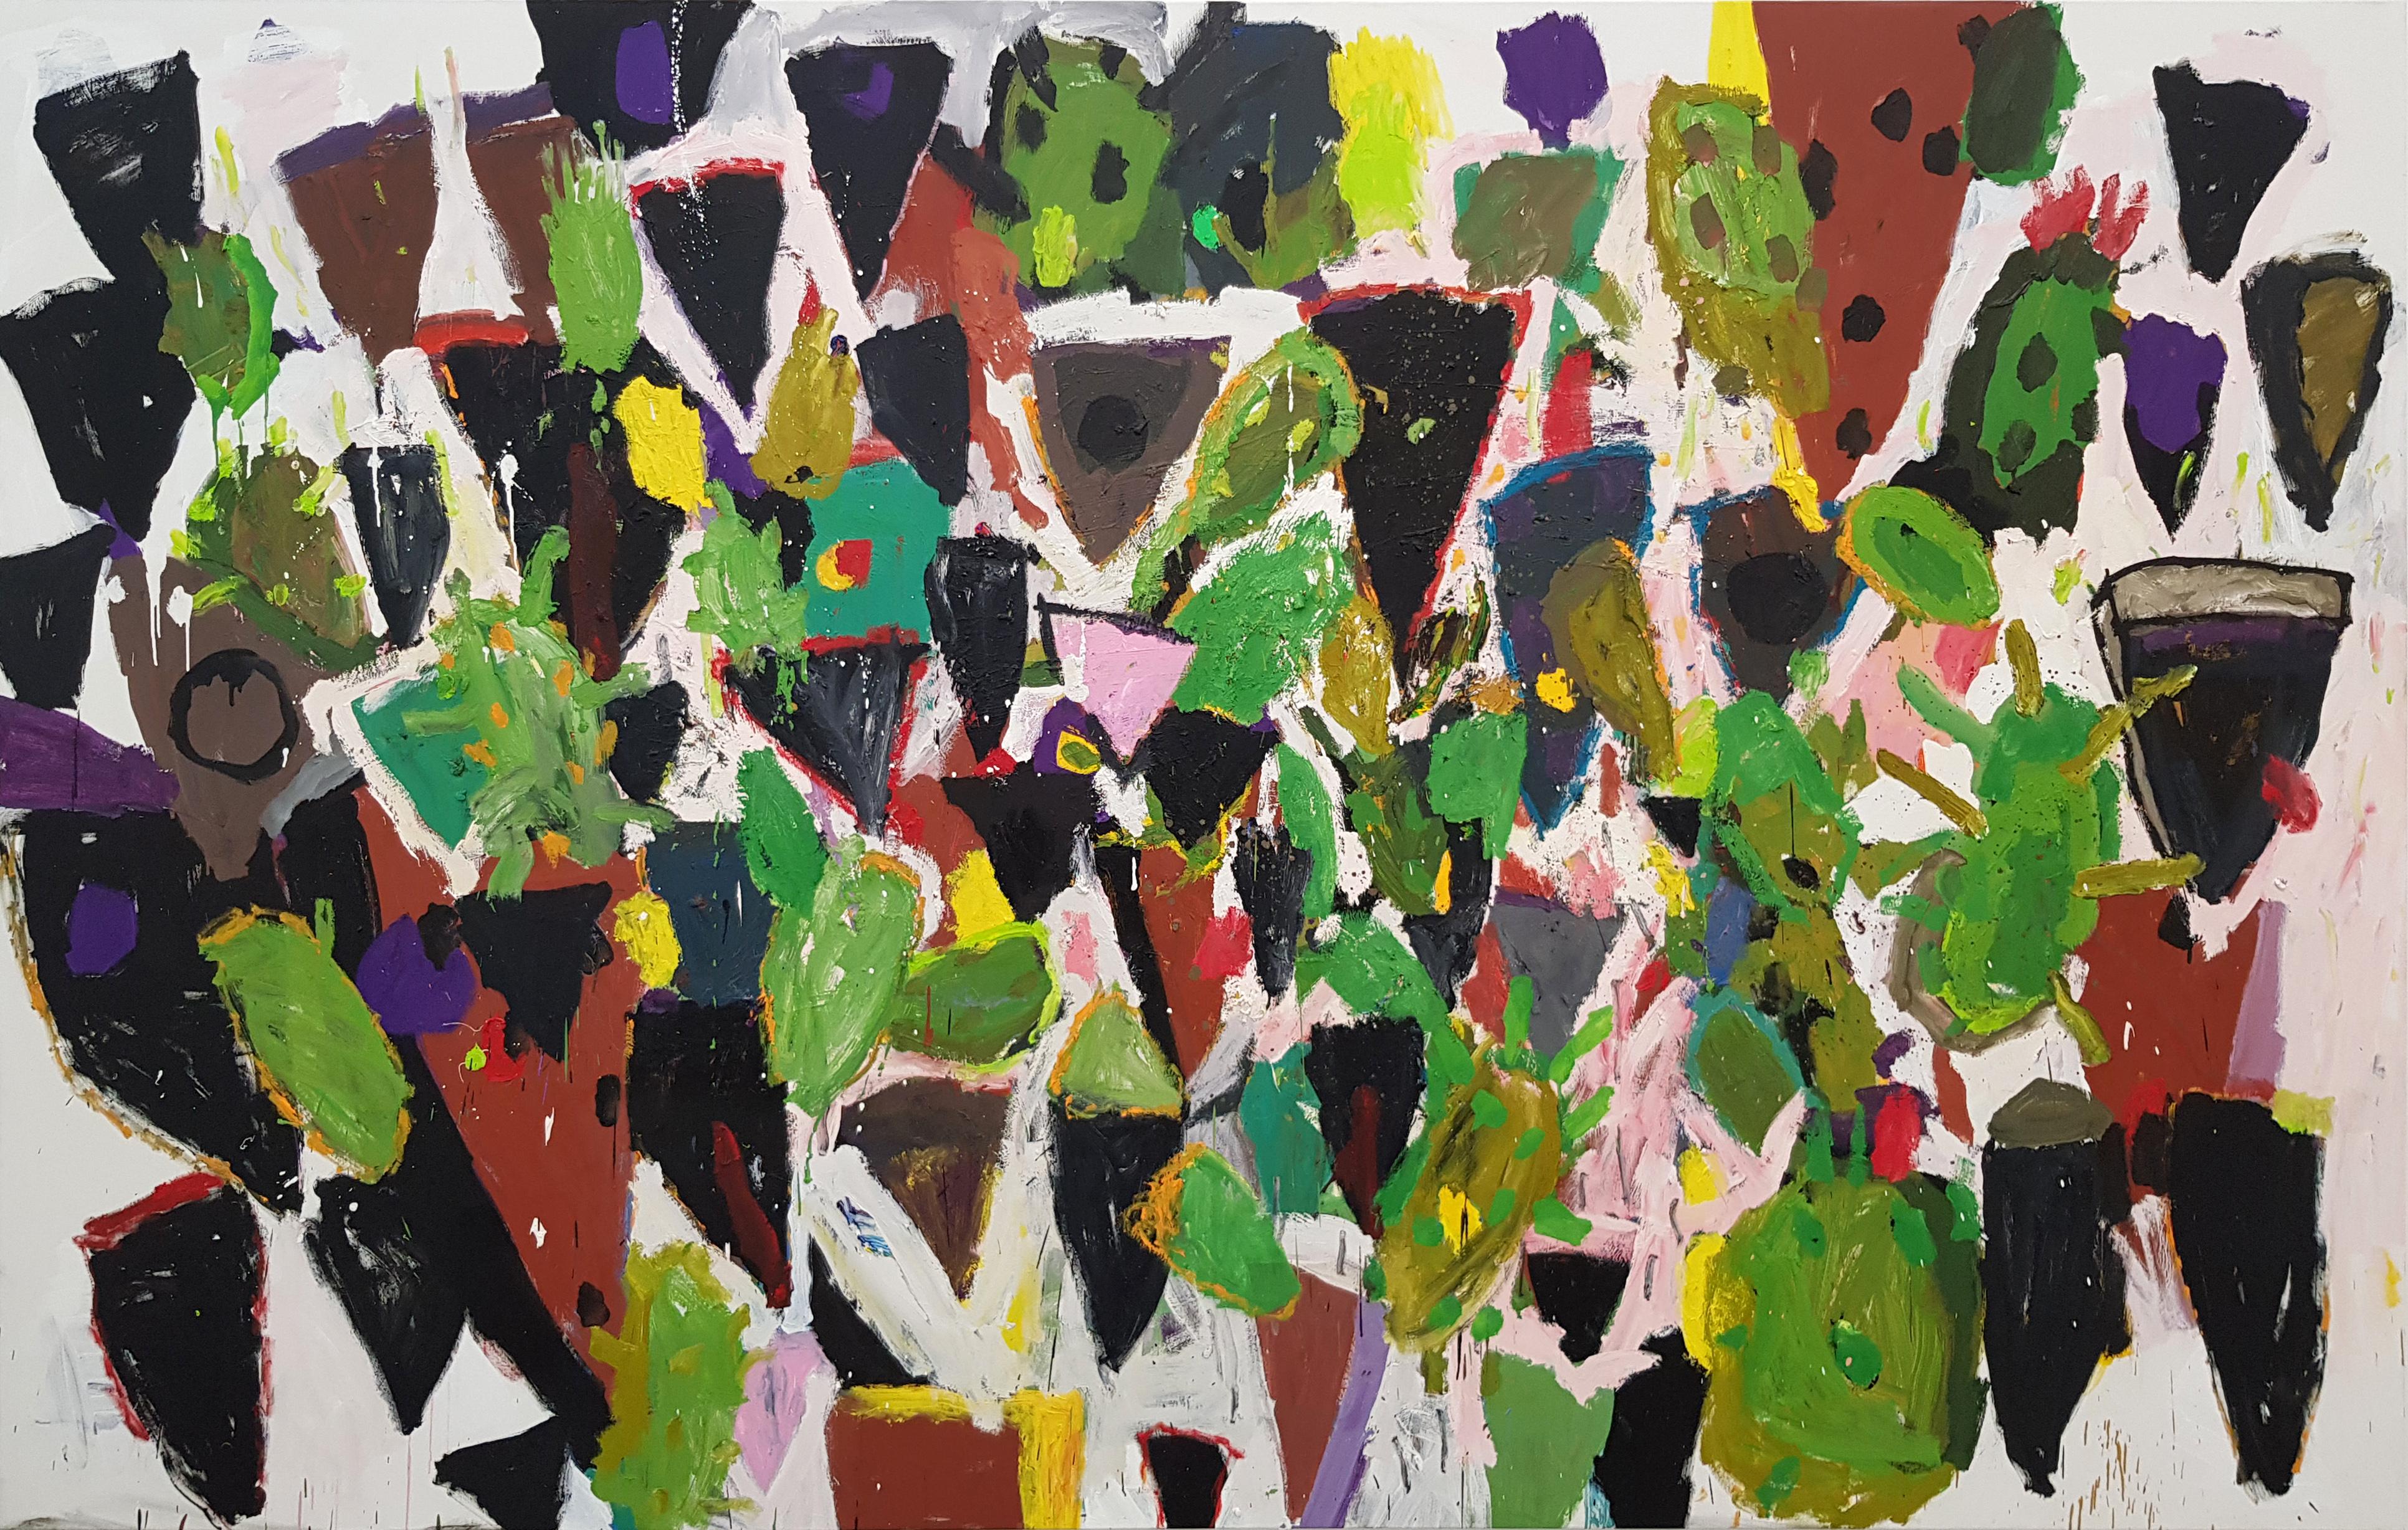 Amit Cabessa, 2018, Oil on canvas, 200x322 cm